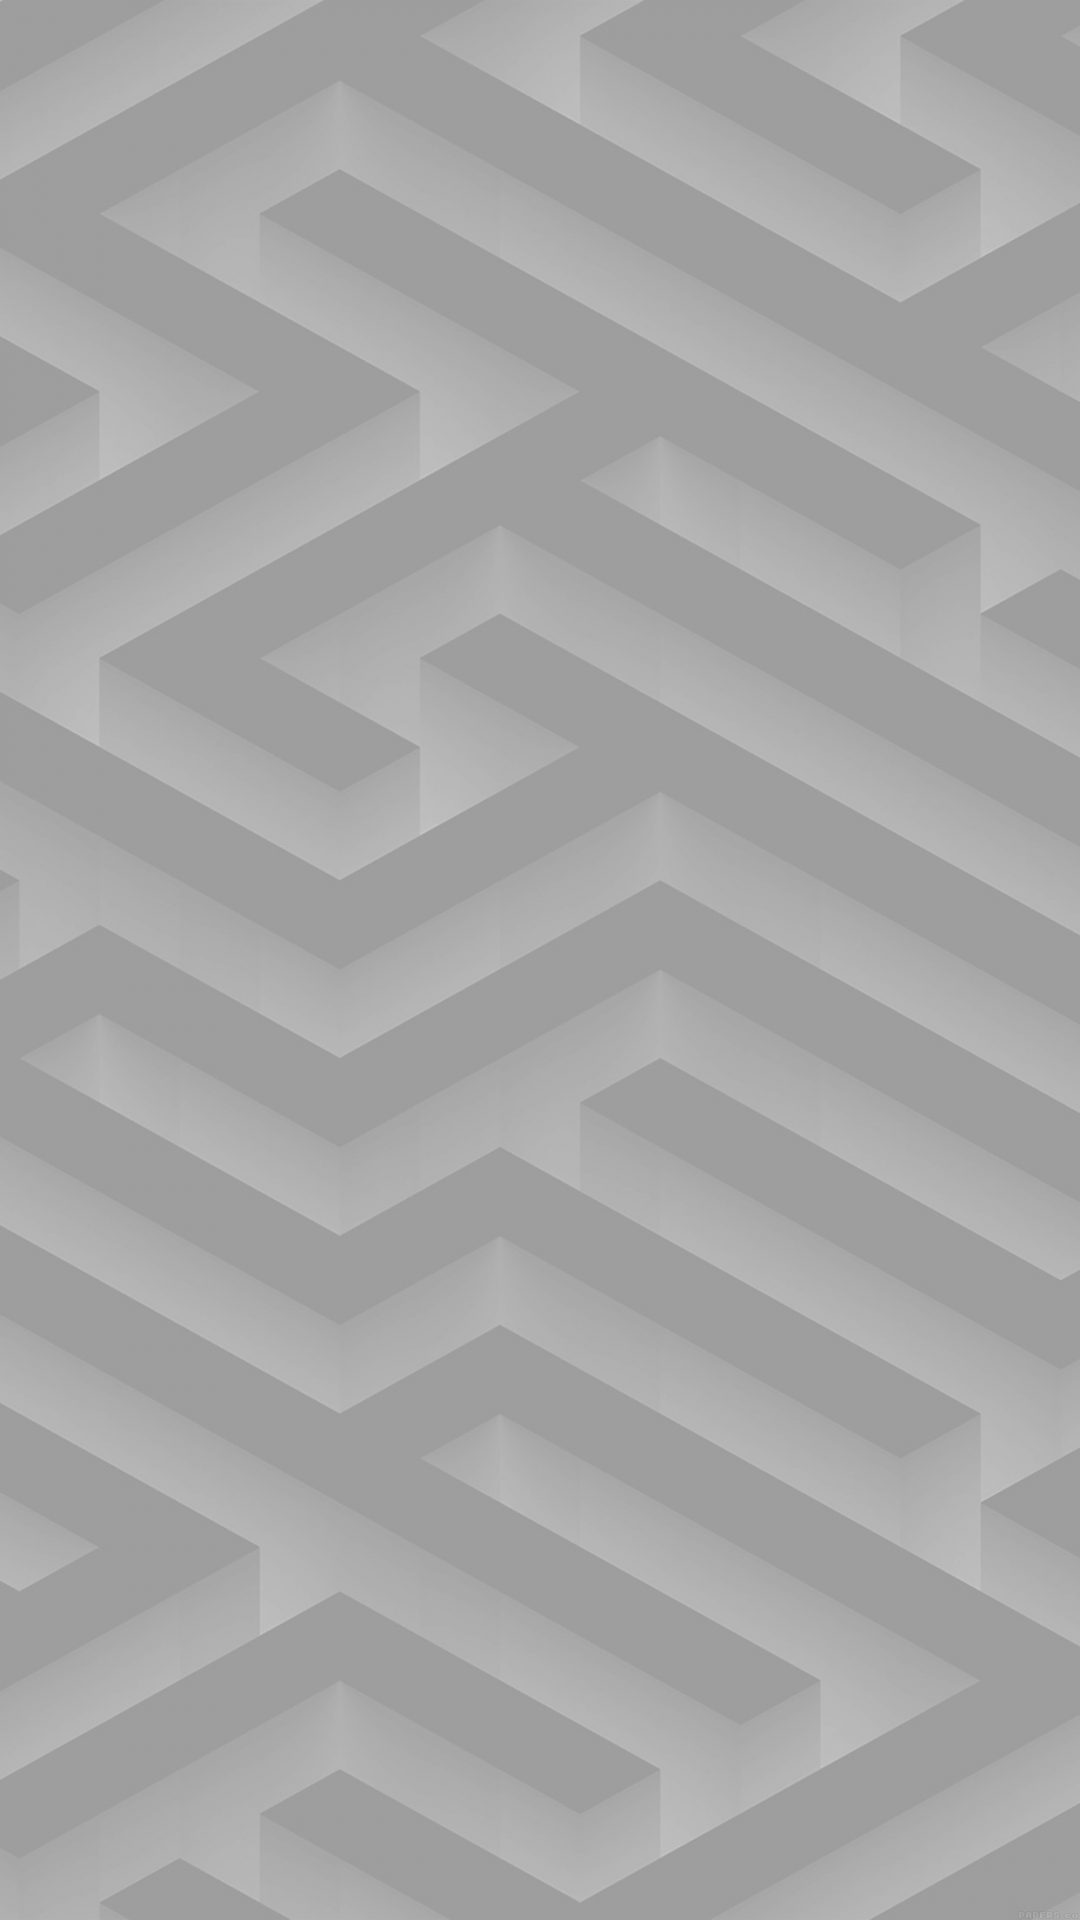 Maze Art White Abstract Patterns